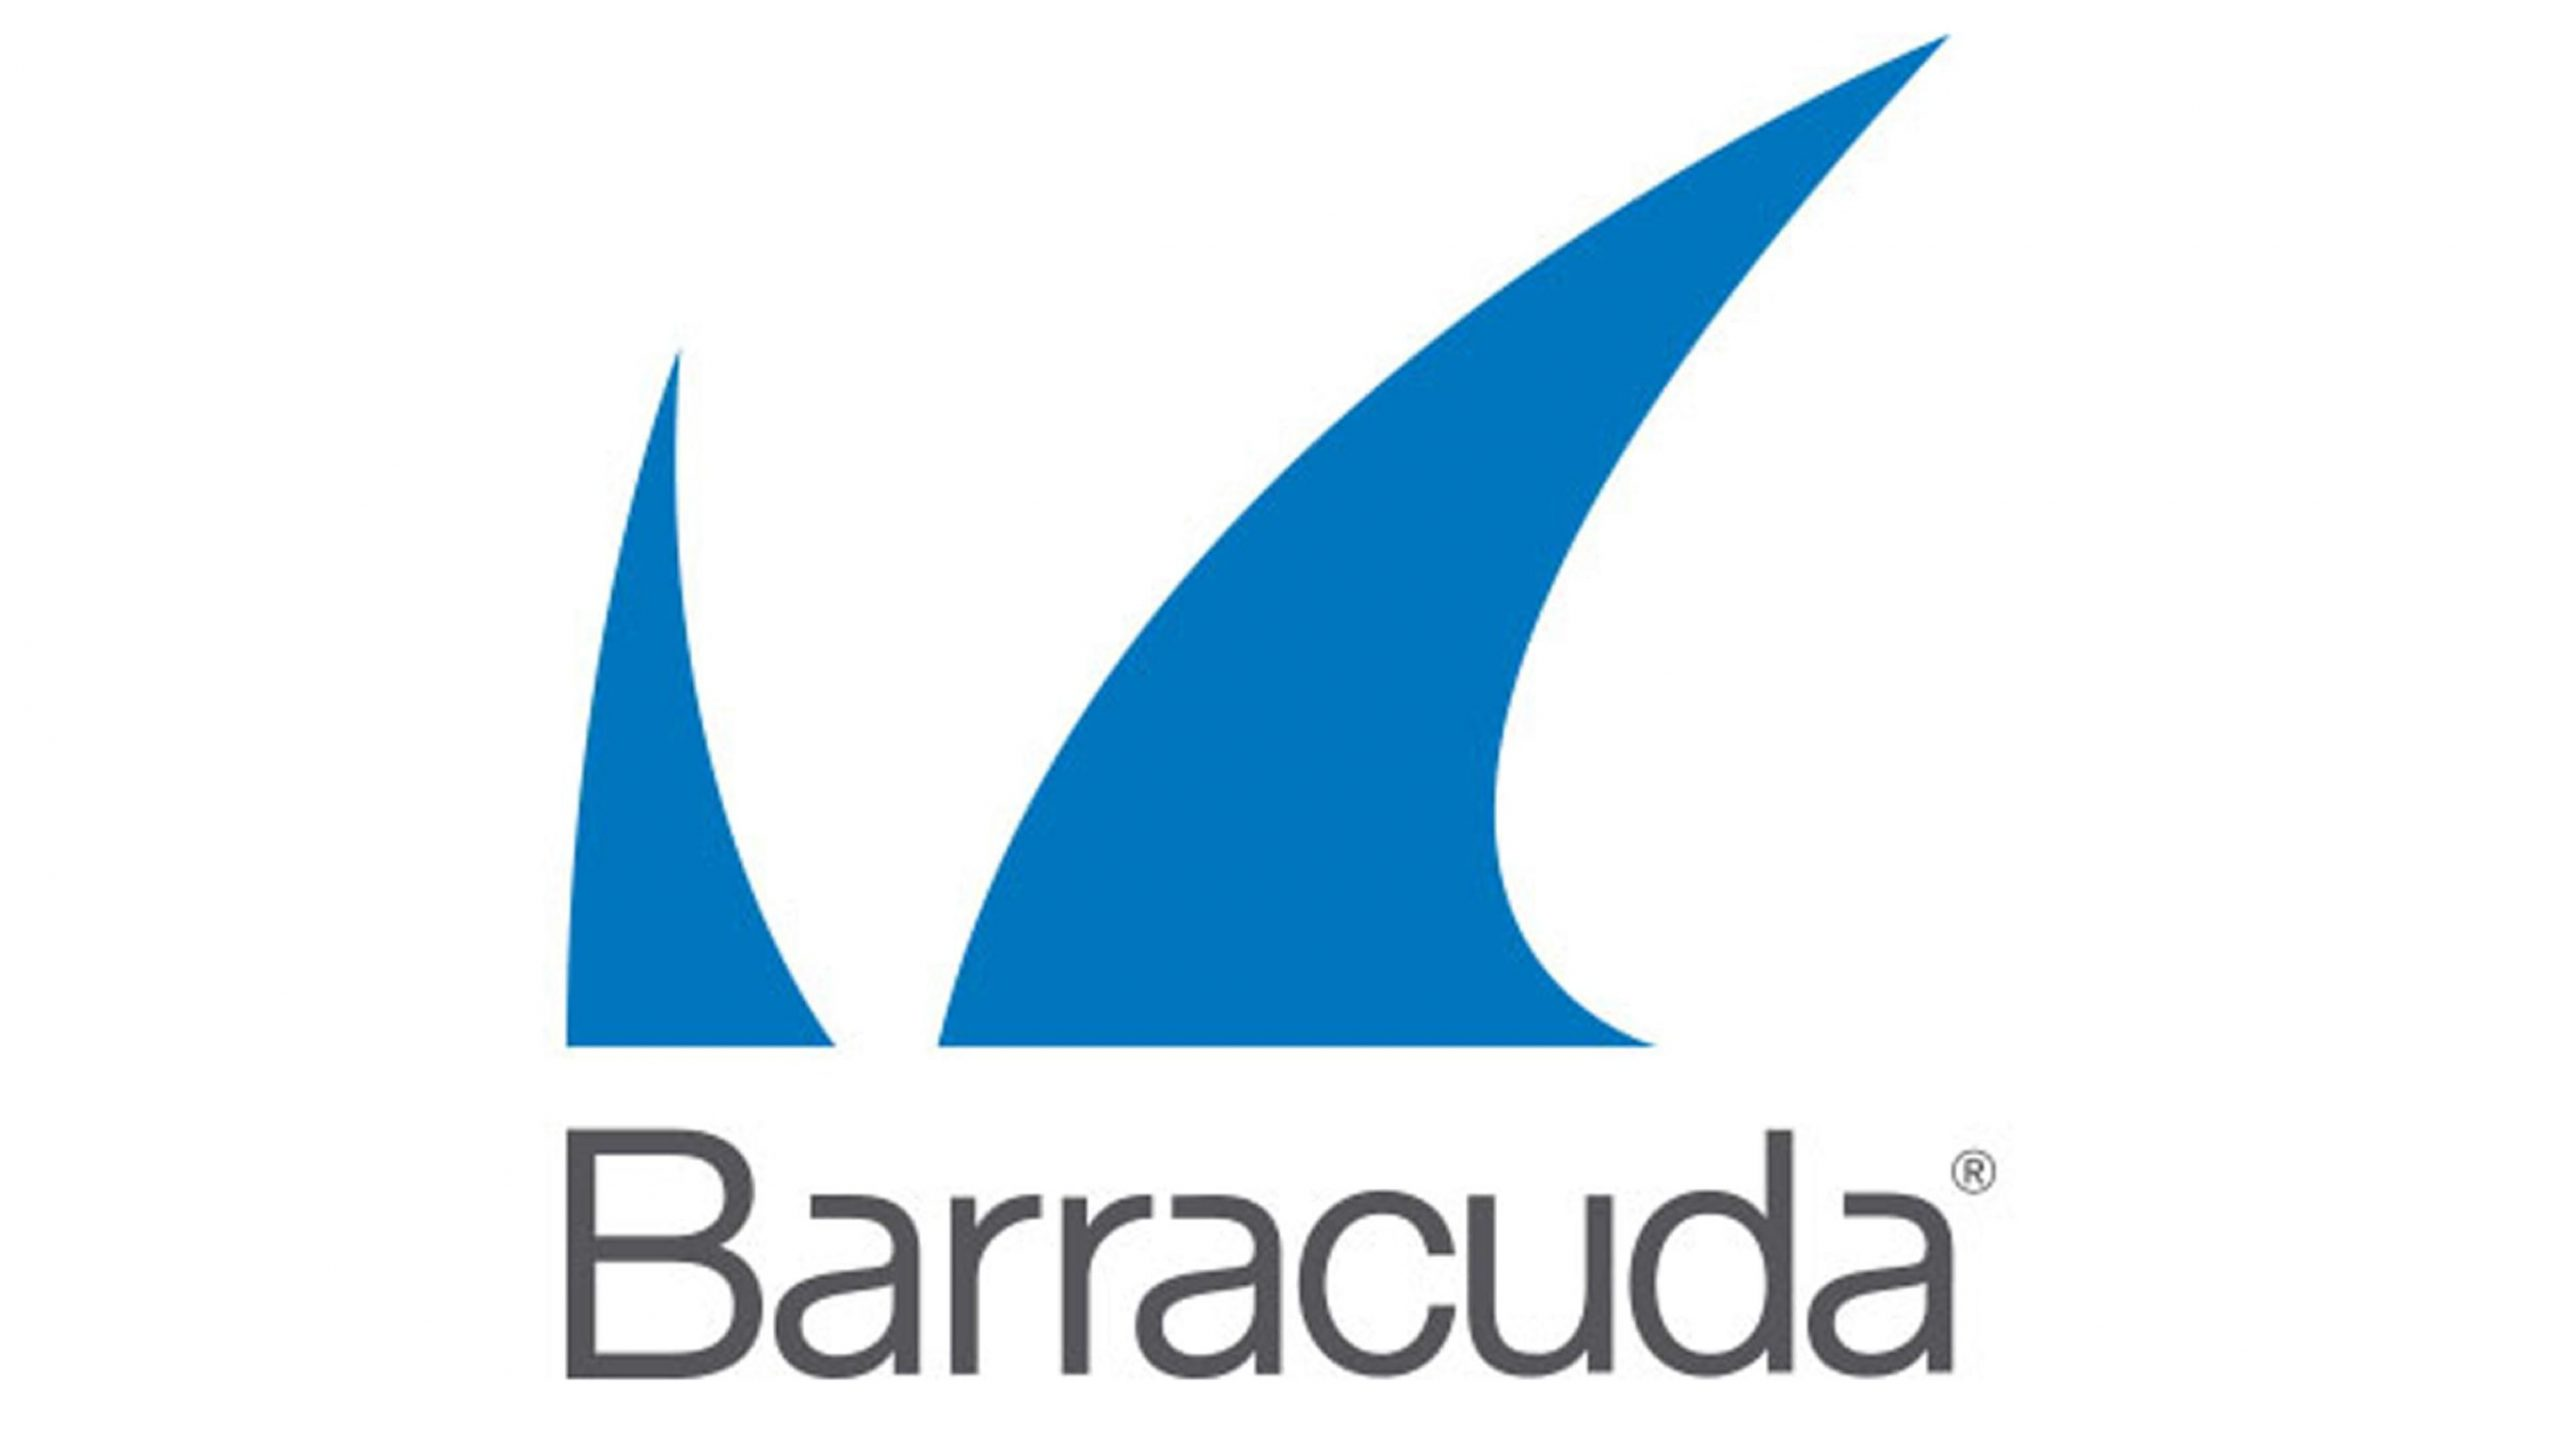 Barracuda Essentials logo